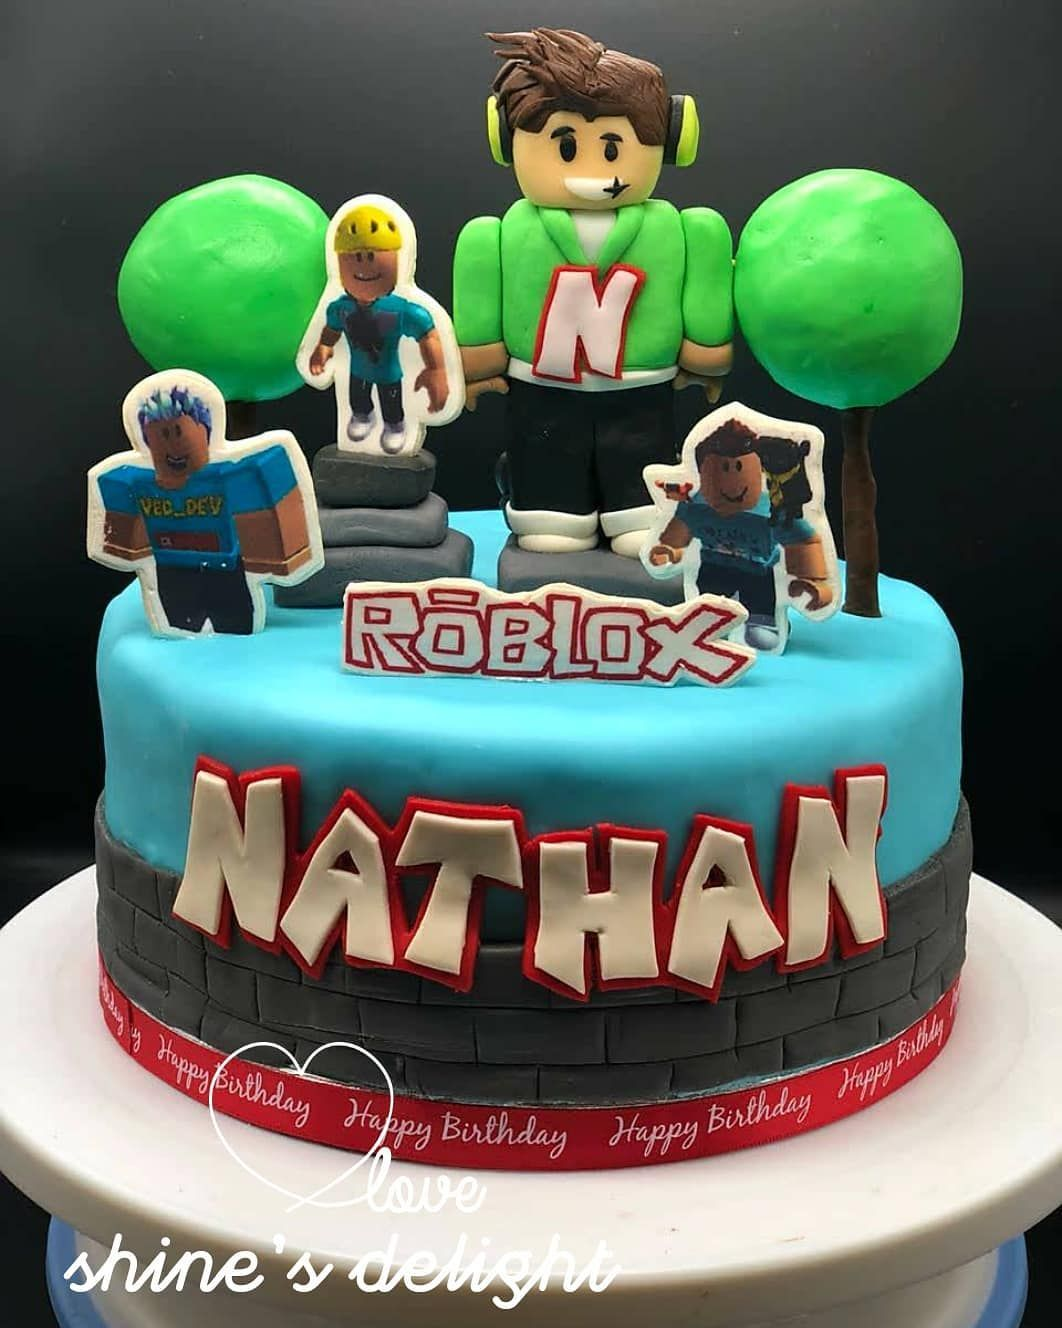 Pin By Lea Chapman On Roblox In 2020 Roblox Birthday Cake Boy